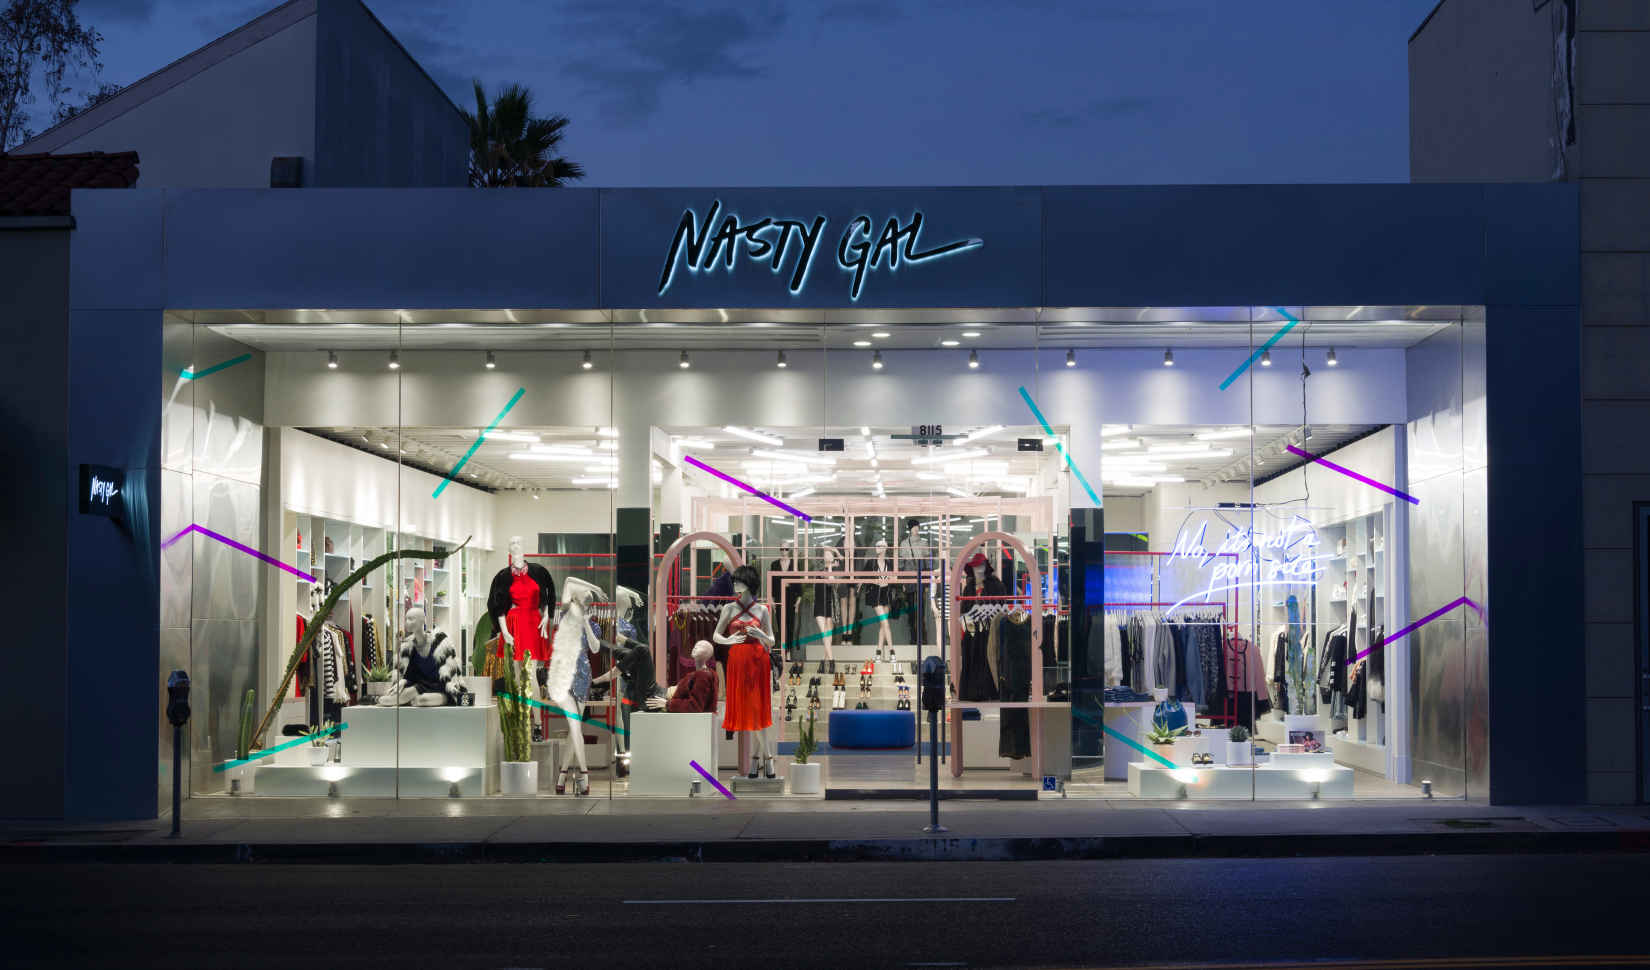 Photo: nastygal.com